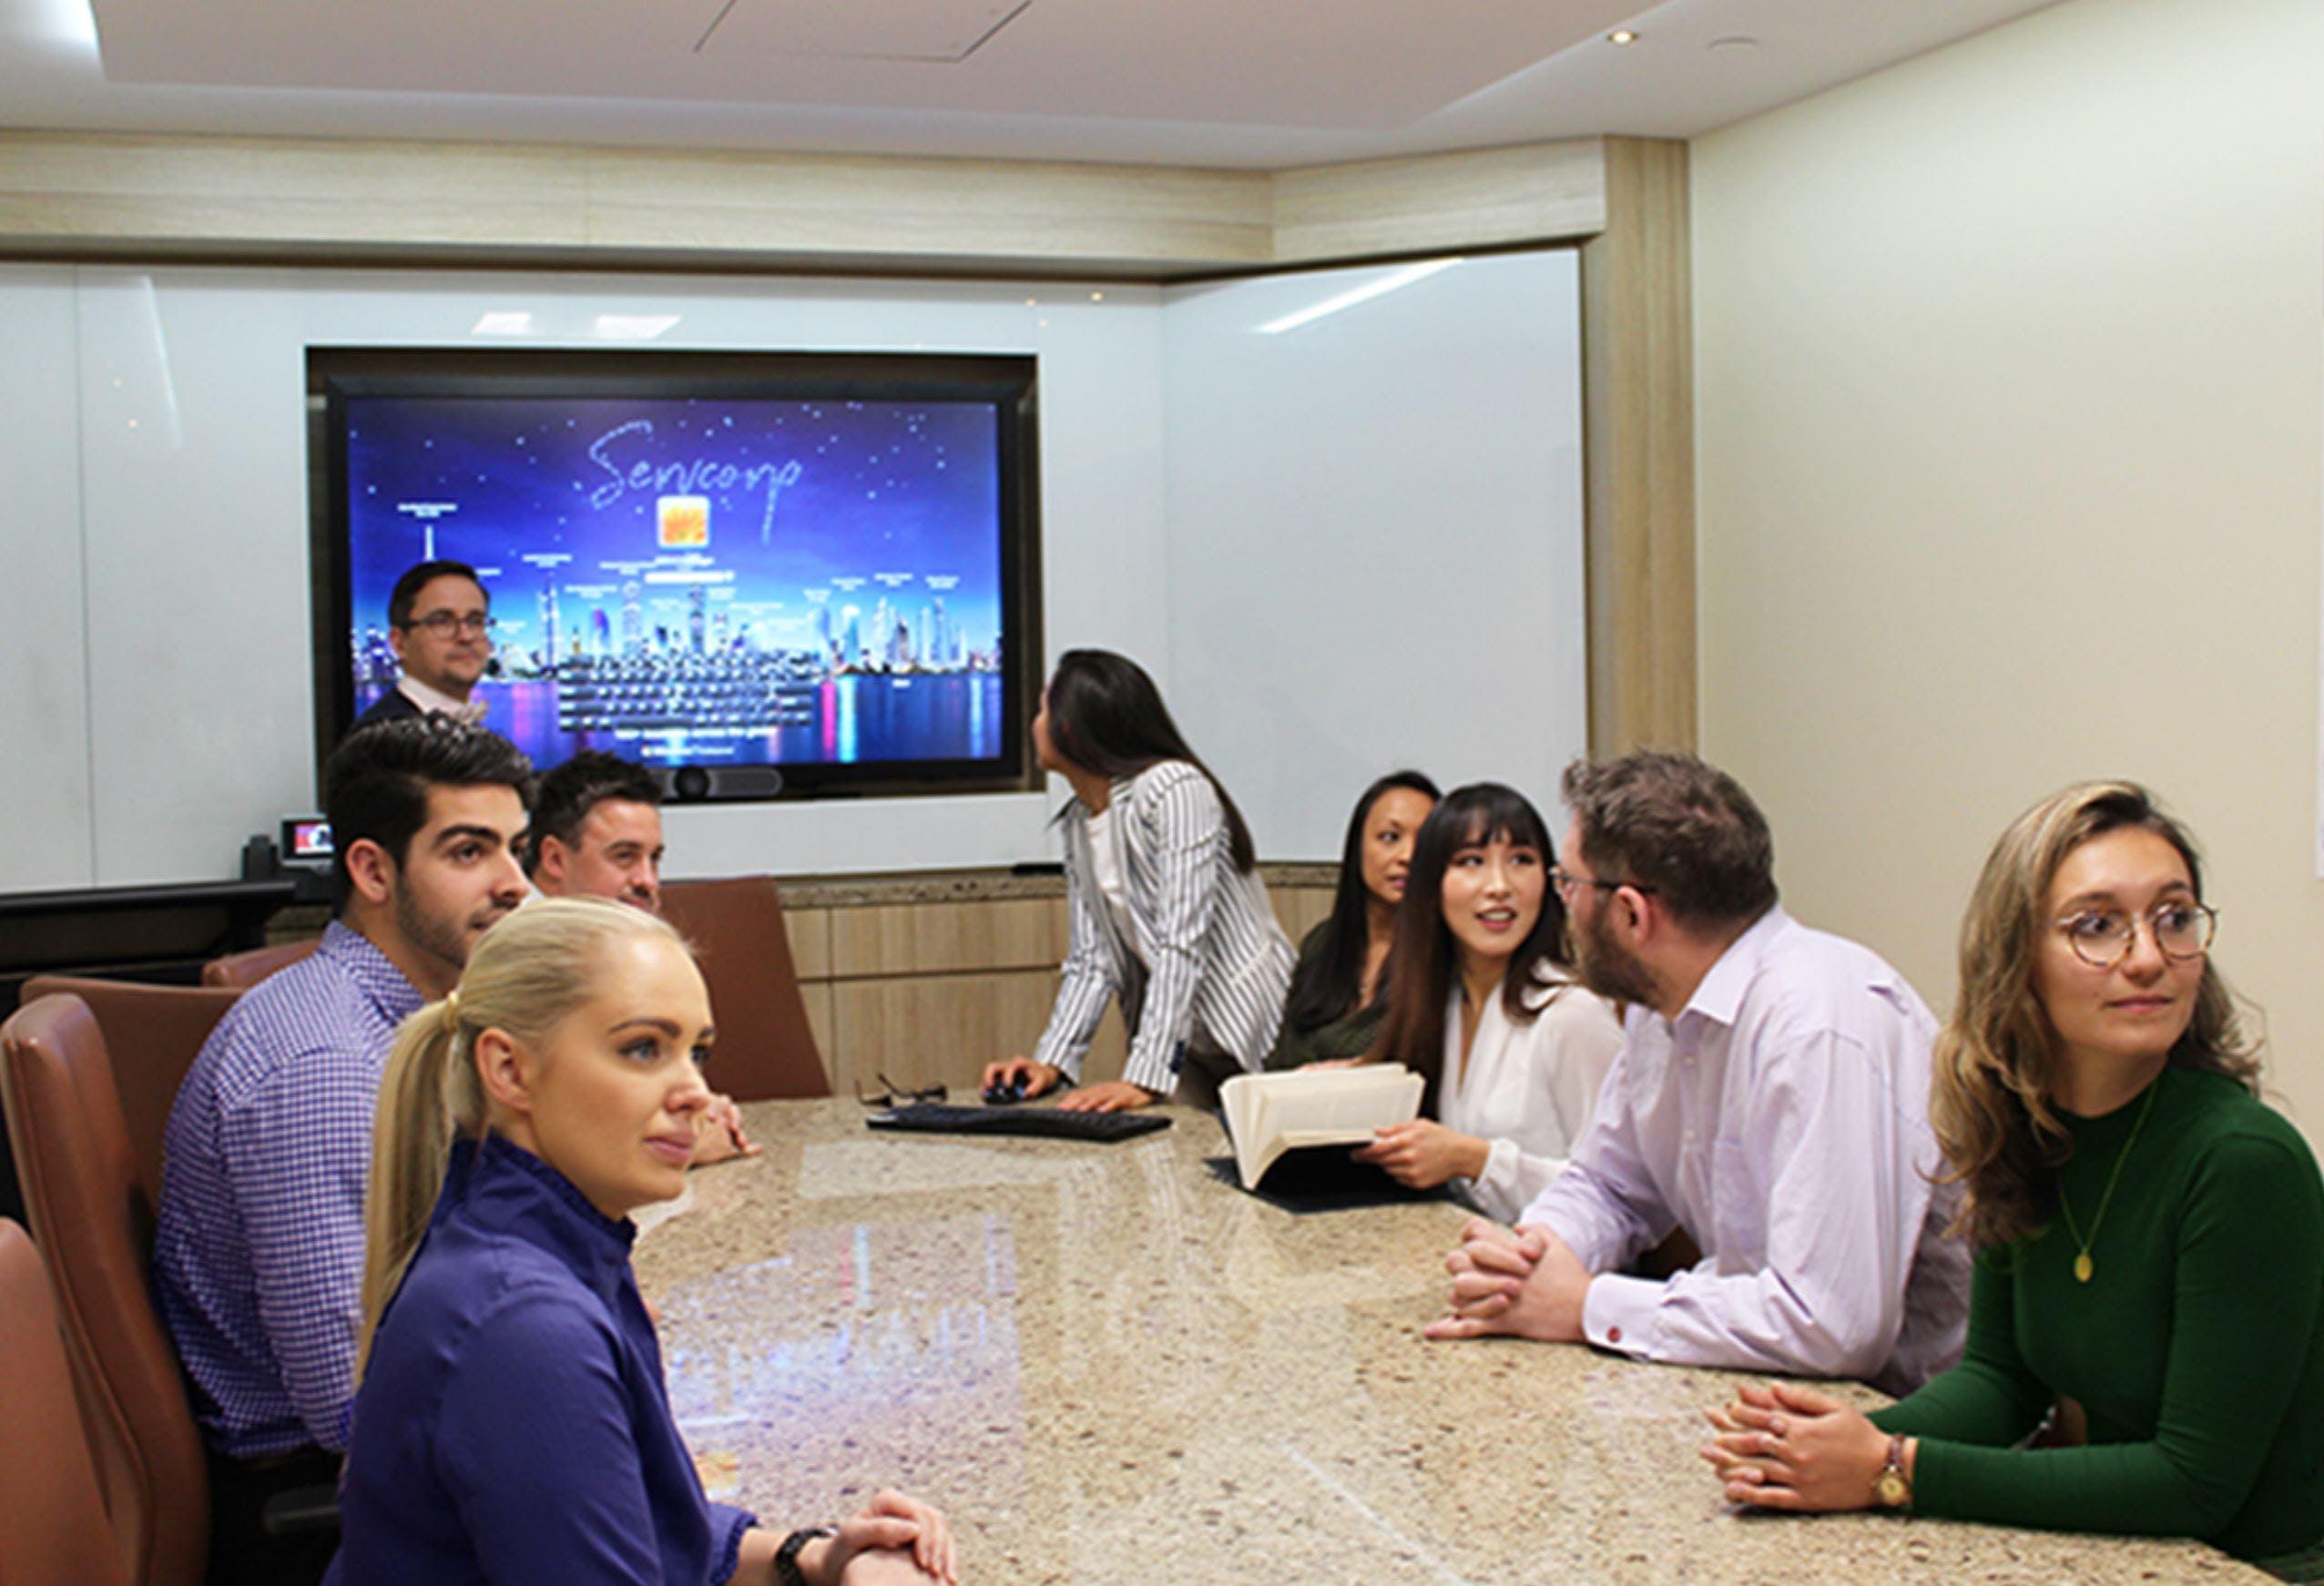 Premium Boardroom , meeting room at Deloitte Building, image 1